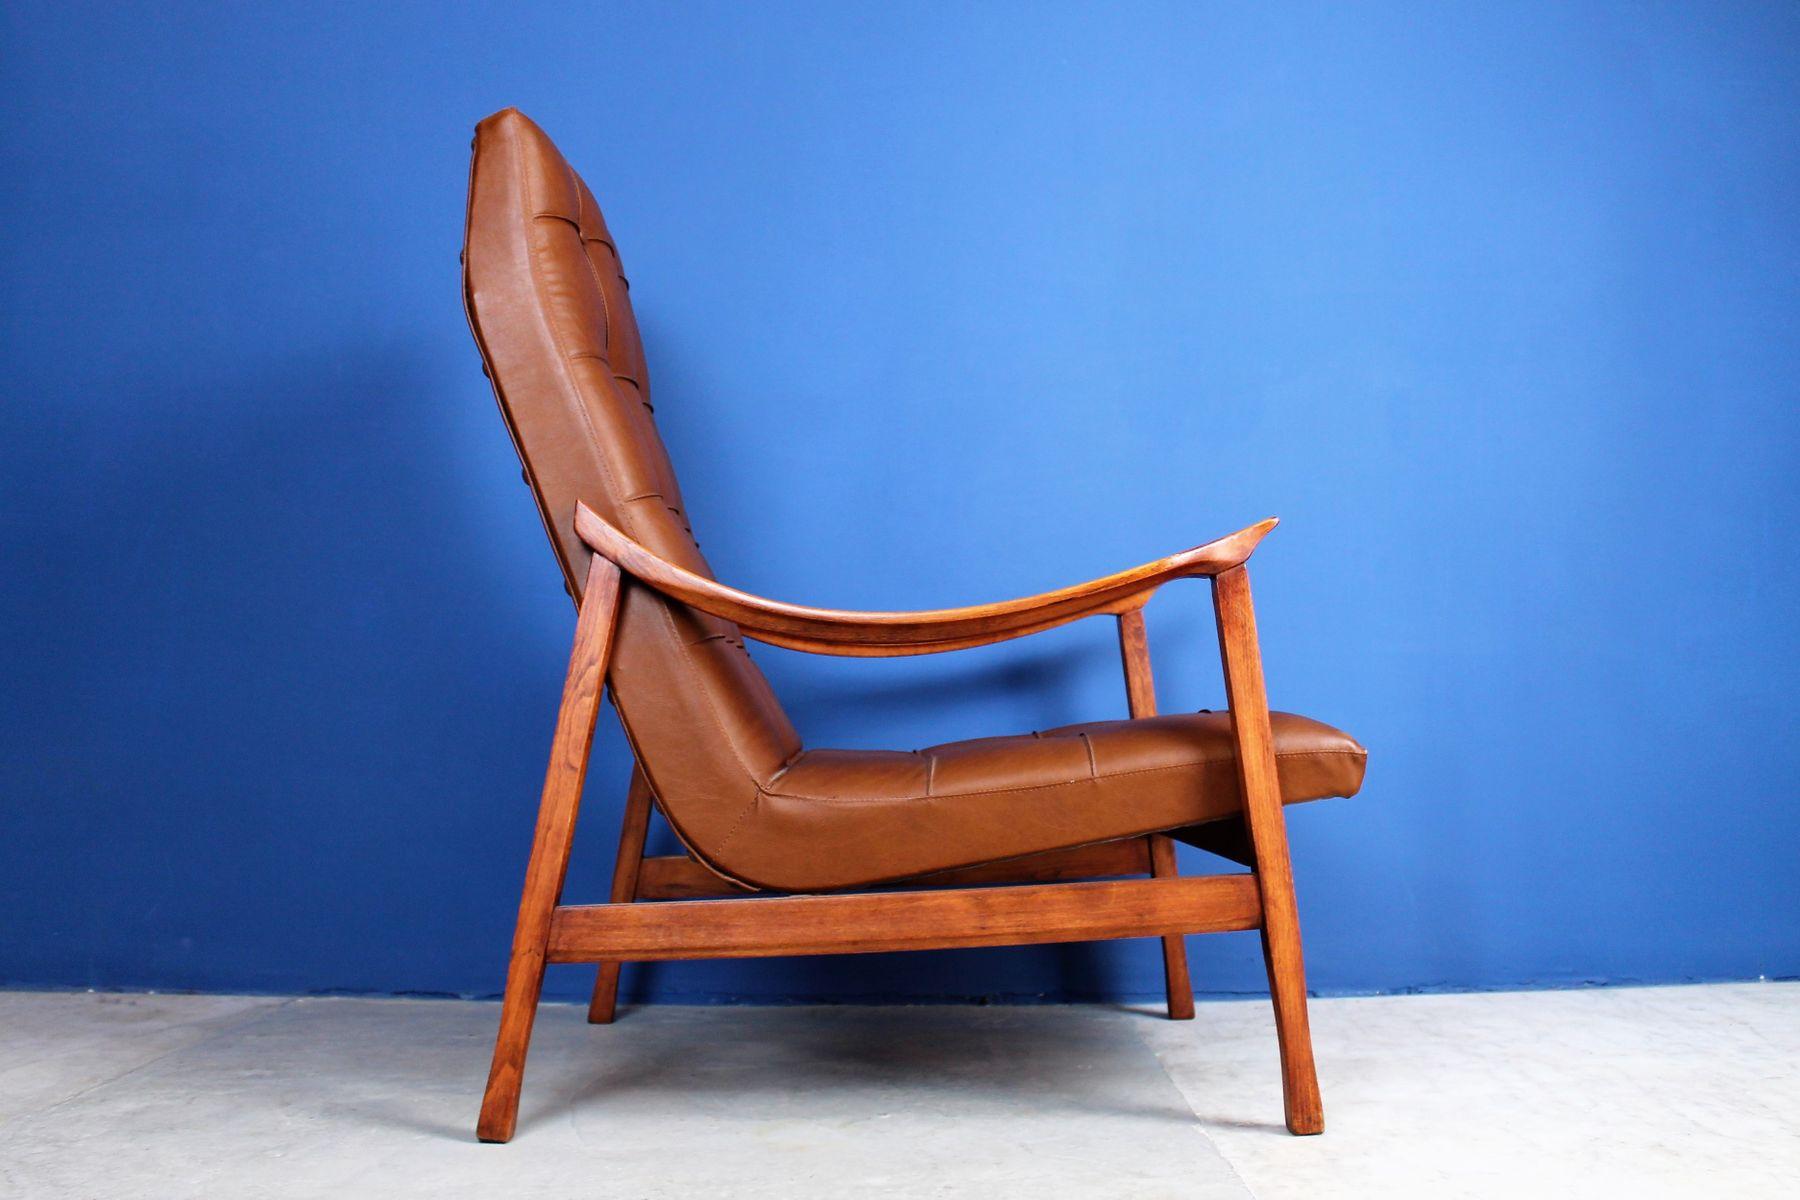 skandinavischer mid century sessel aus holz und koleder. Black Bedroom Furniture Sets. Home Design Ideas